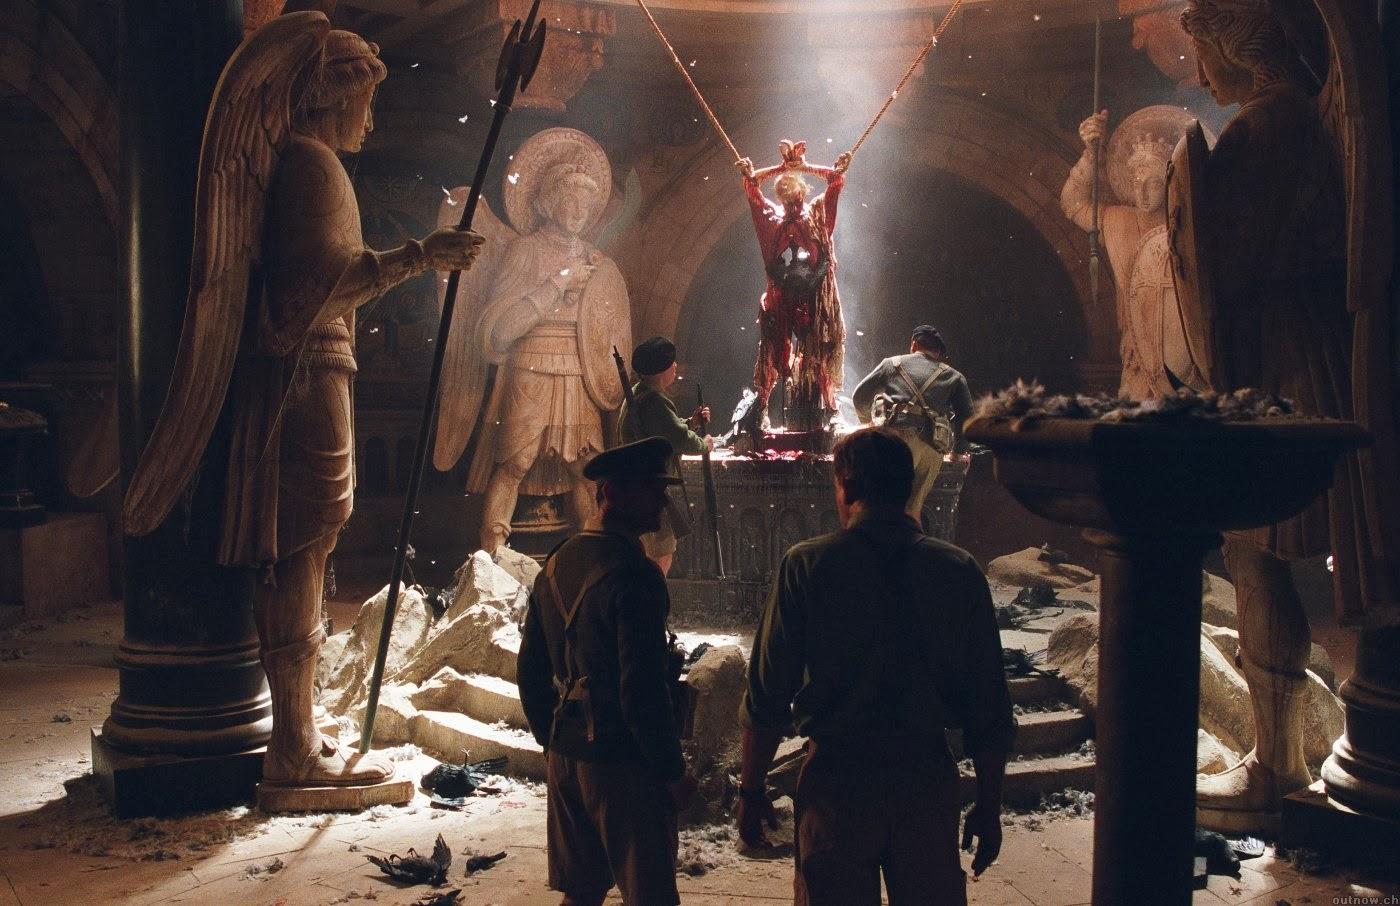 Stellan Skarsgård, Julian Wadham enter the desecrated church in Exorcist: The Beginning (2004)